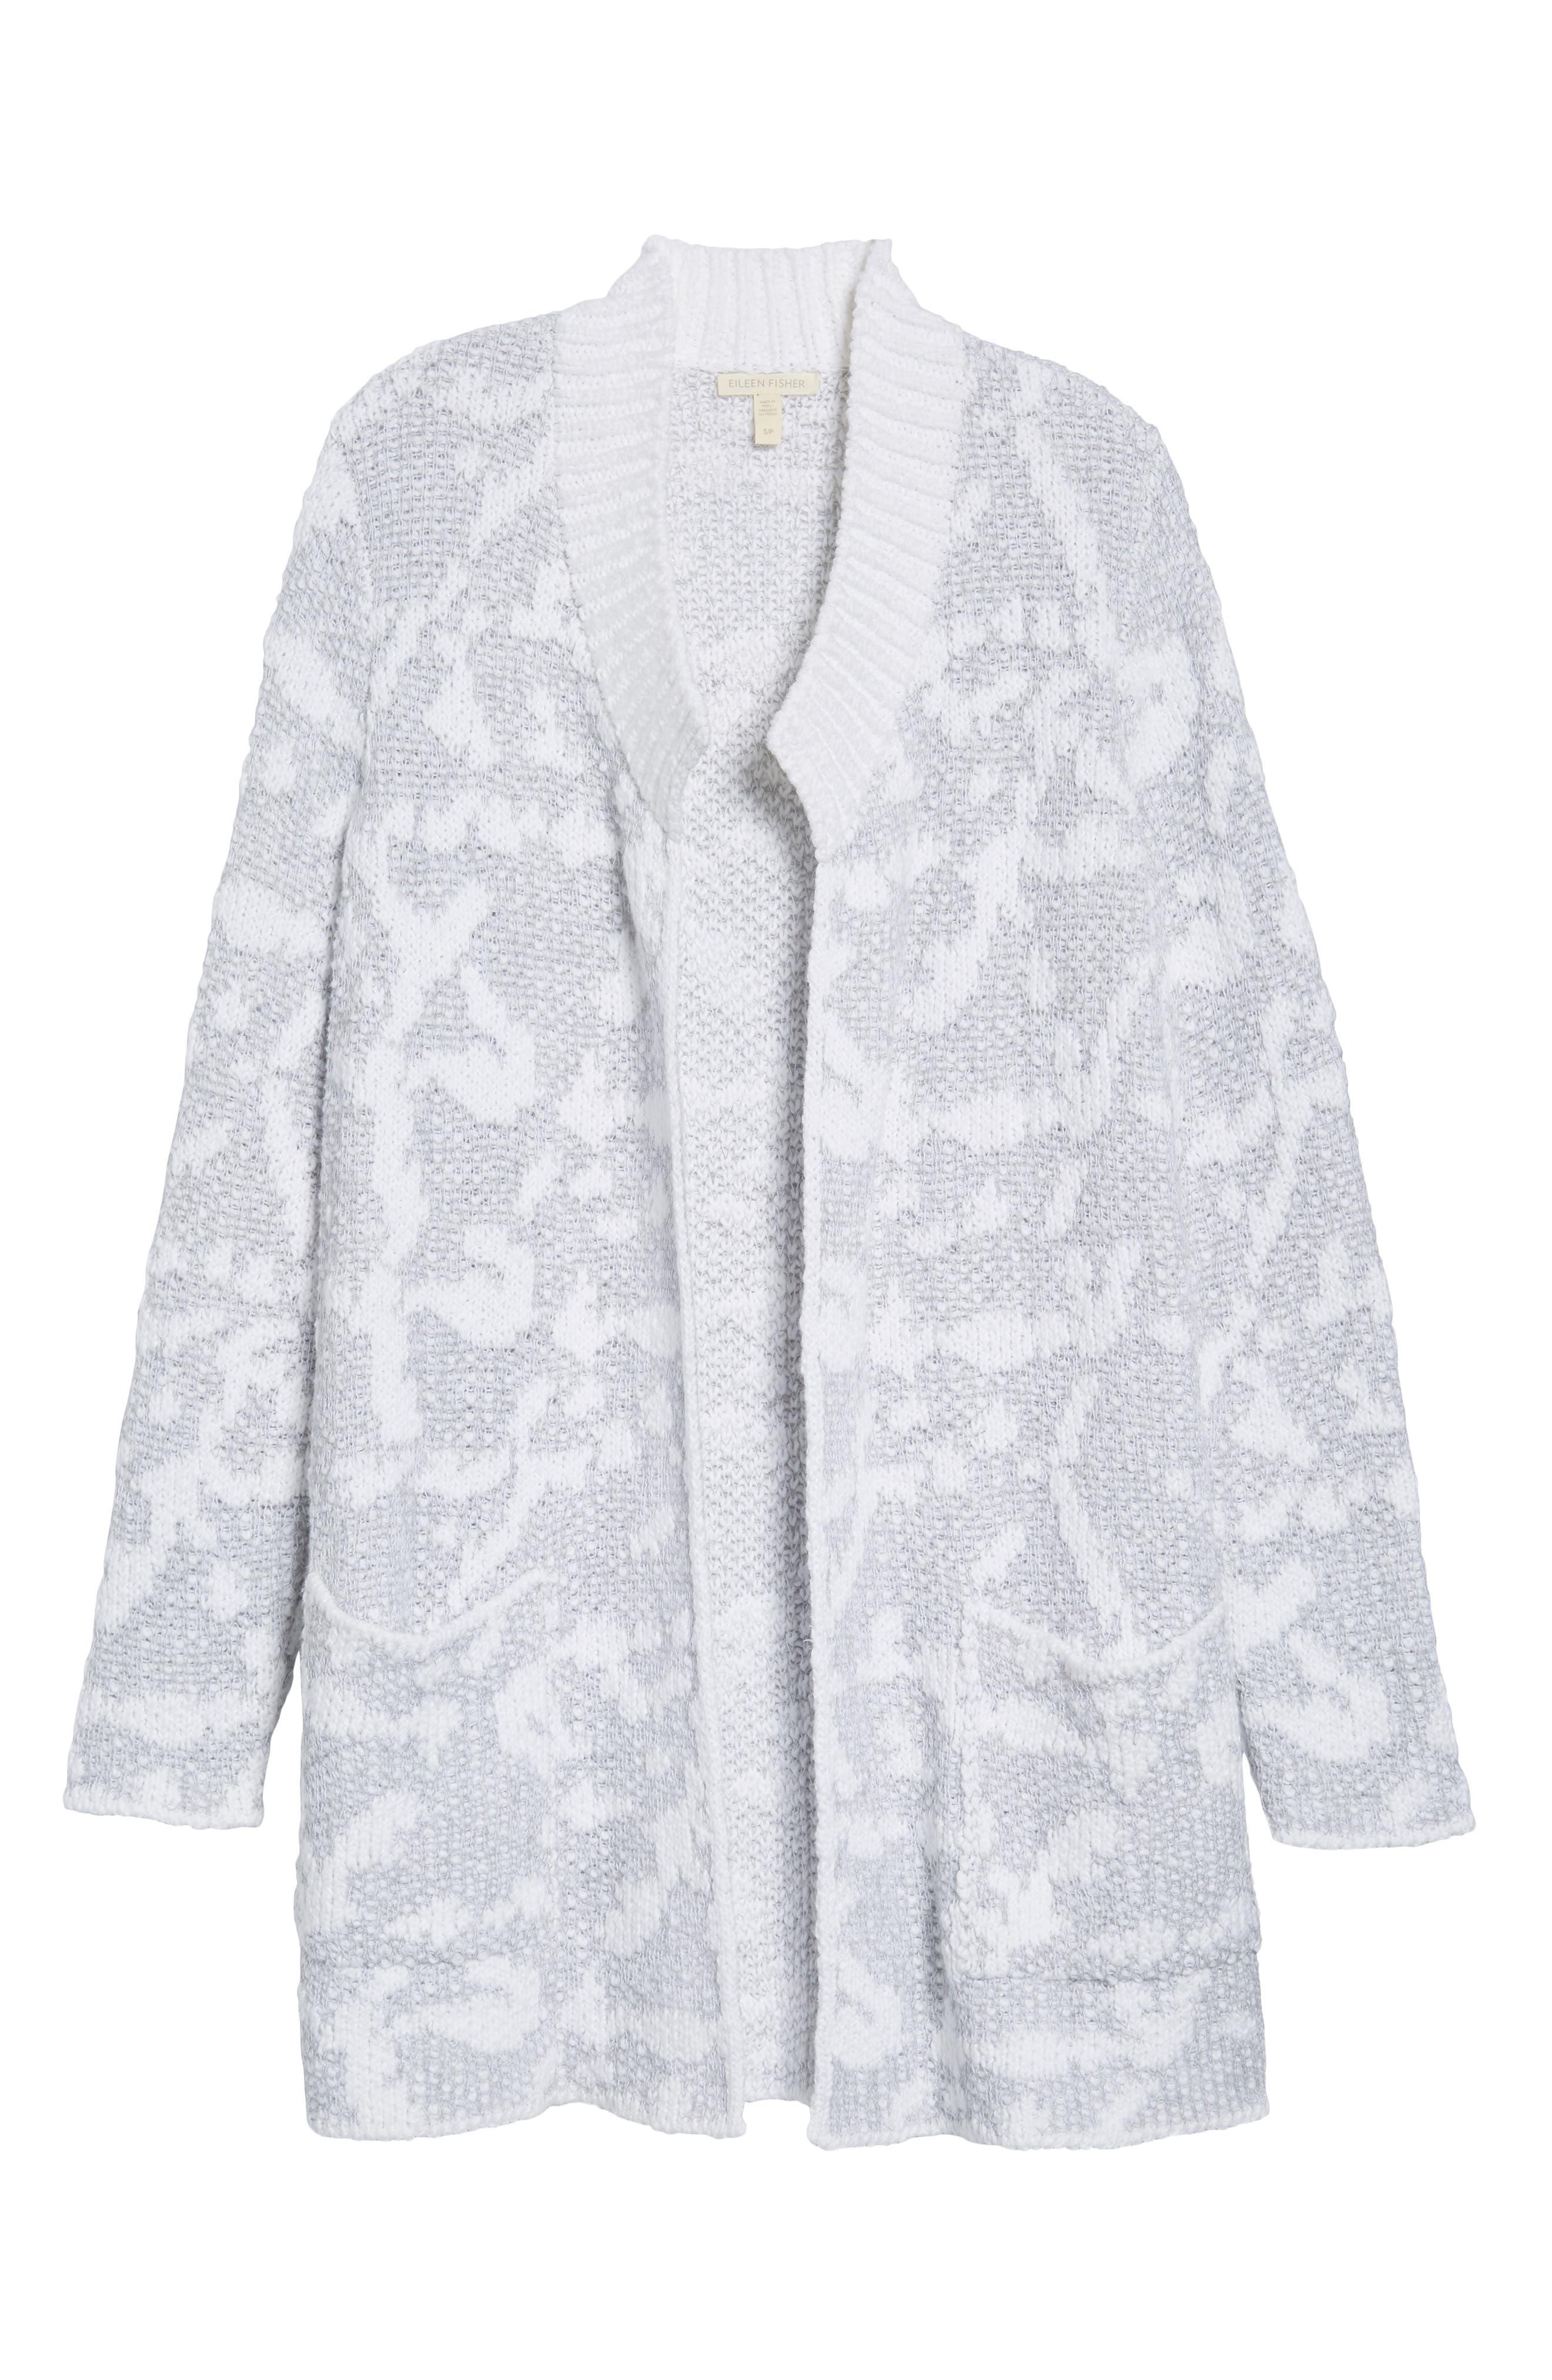 Organic Cotton Pocket Cardigan,                             Alternate thumbnail 6, color,                             022